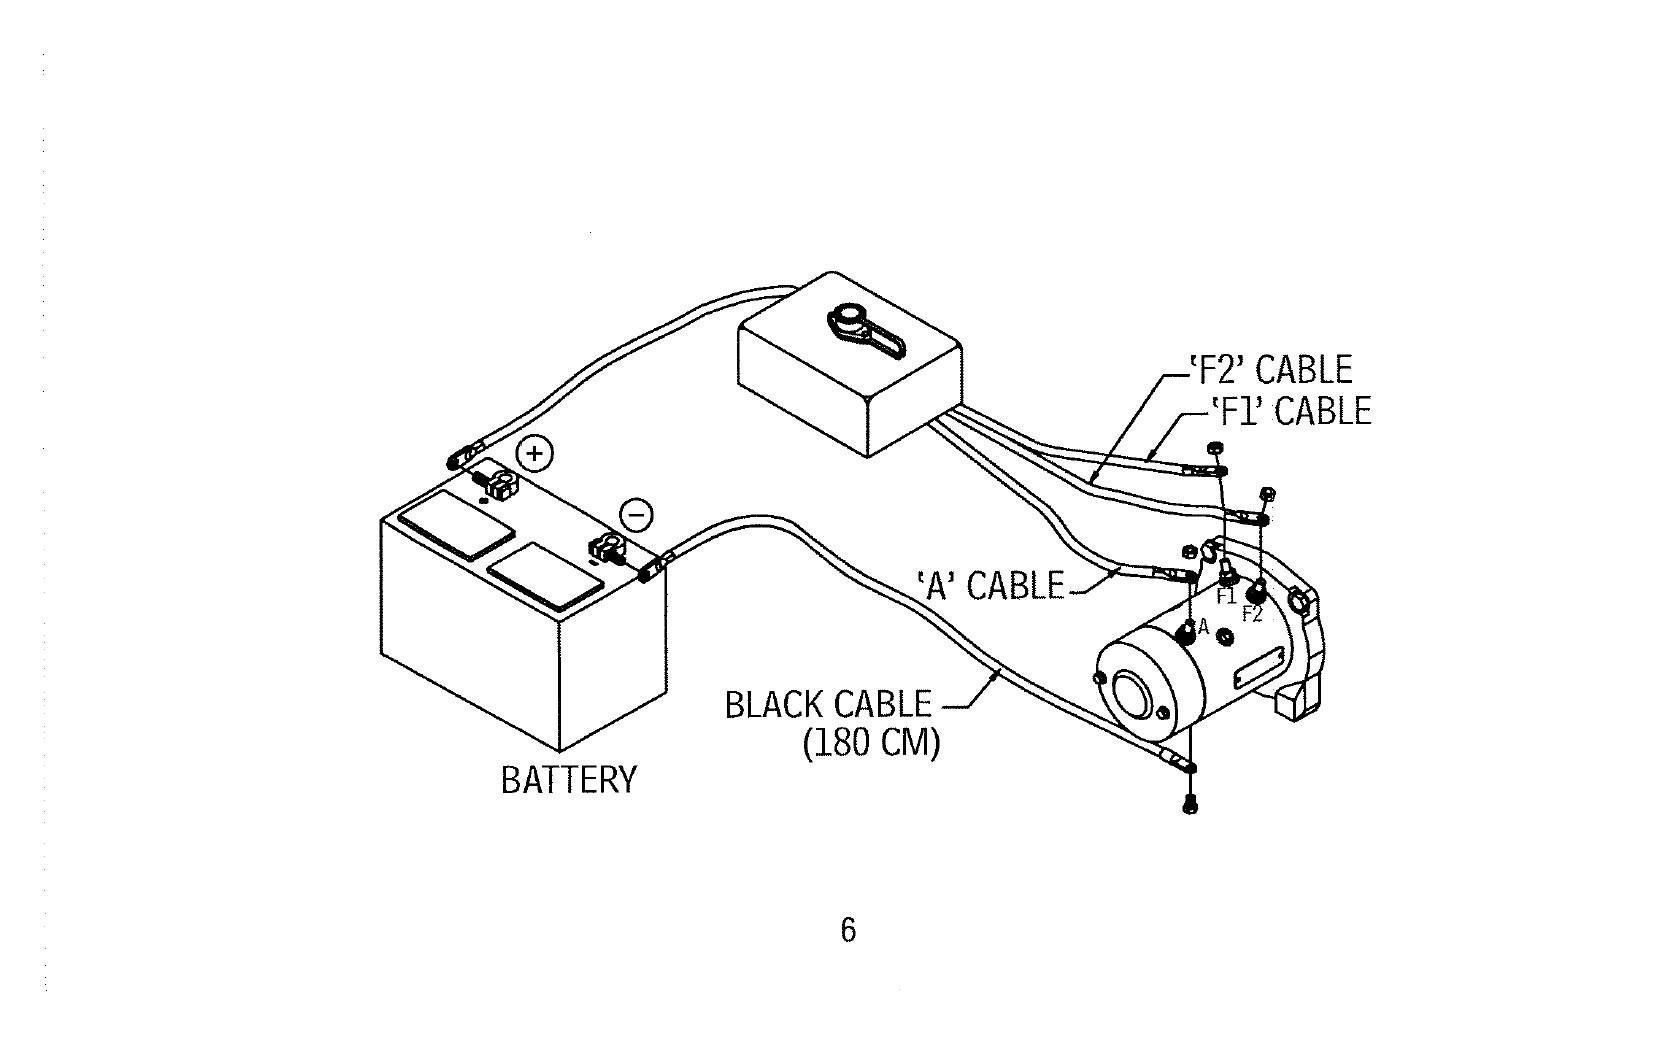 hight resolution of warn a2000 wiring diagram manual e books warn winch remote control warn a2000 winch wiring diagram